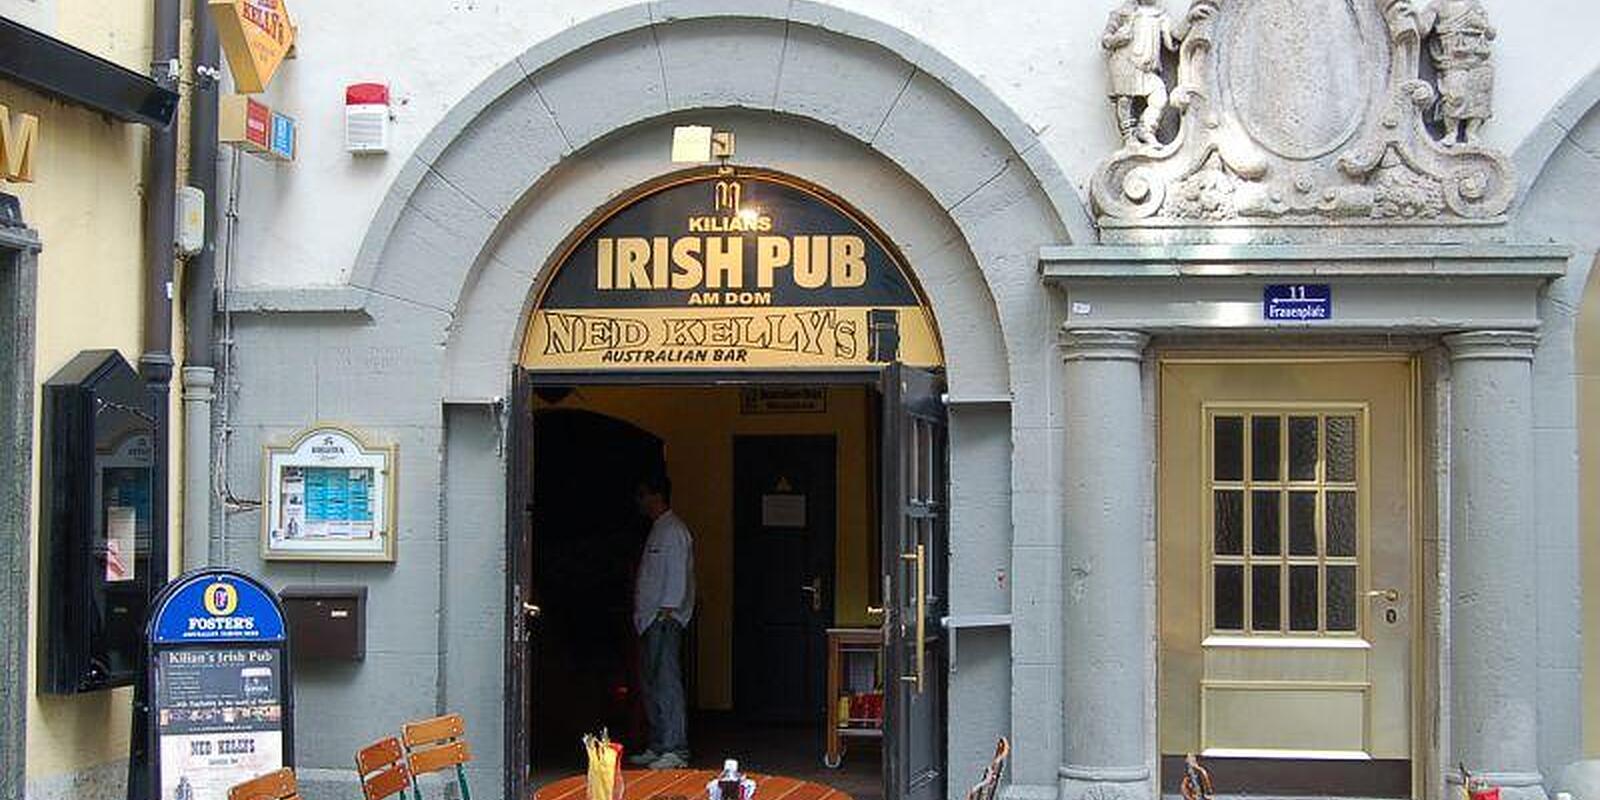 kilians irish pub frauenplatz altstadt m nchen restaurant willkommen. Black Bedroom Furniture Sets. Home Design Ideas